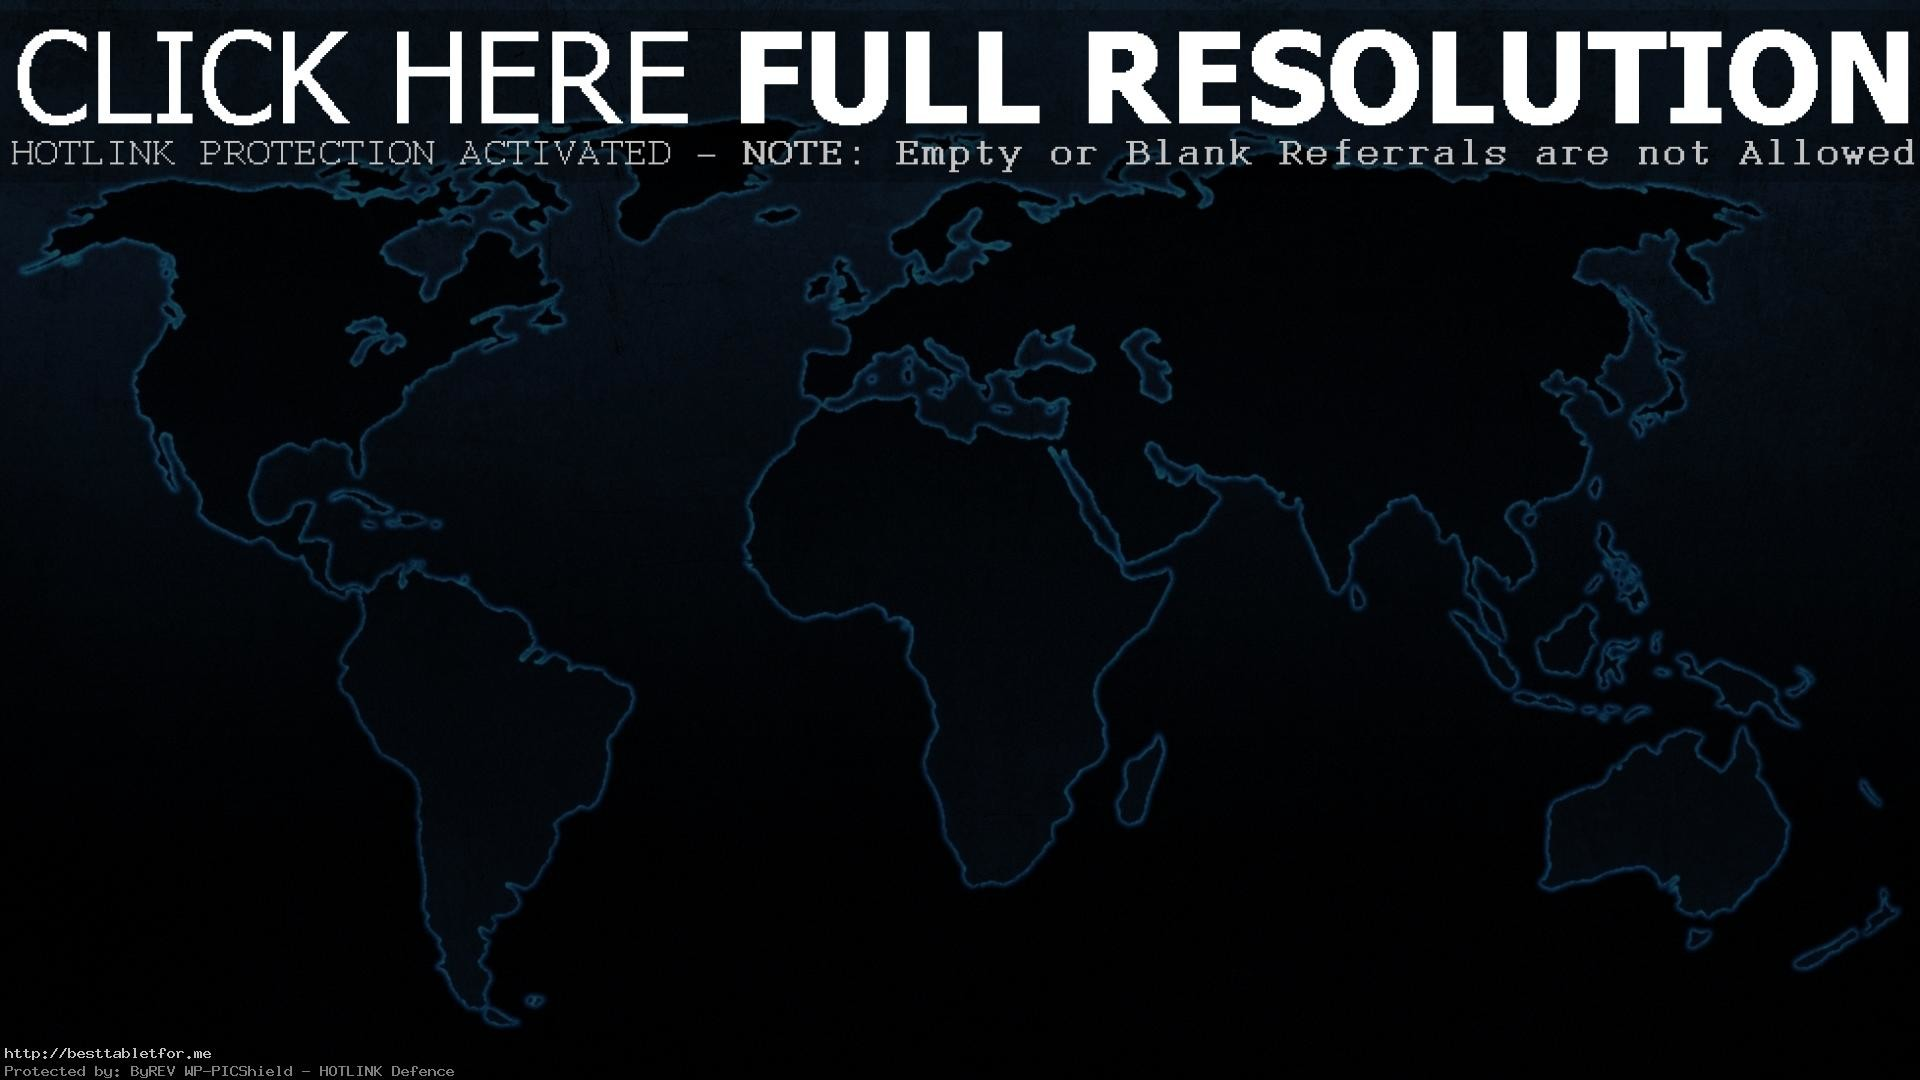 World Map Desktop Wallpaper Images - National geographic world map wallpaper